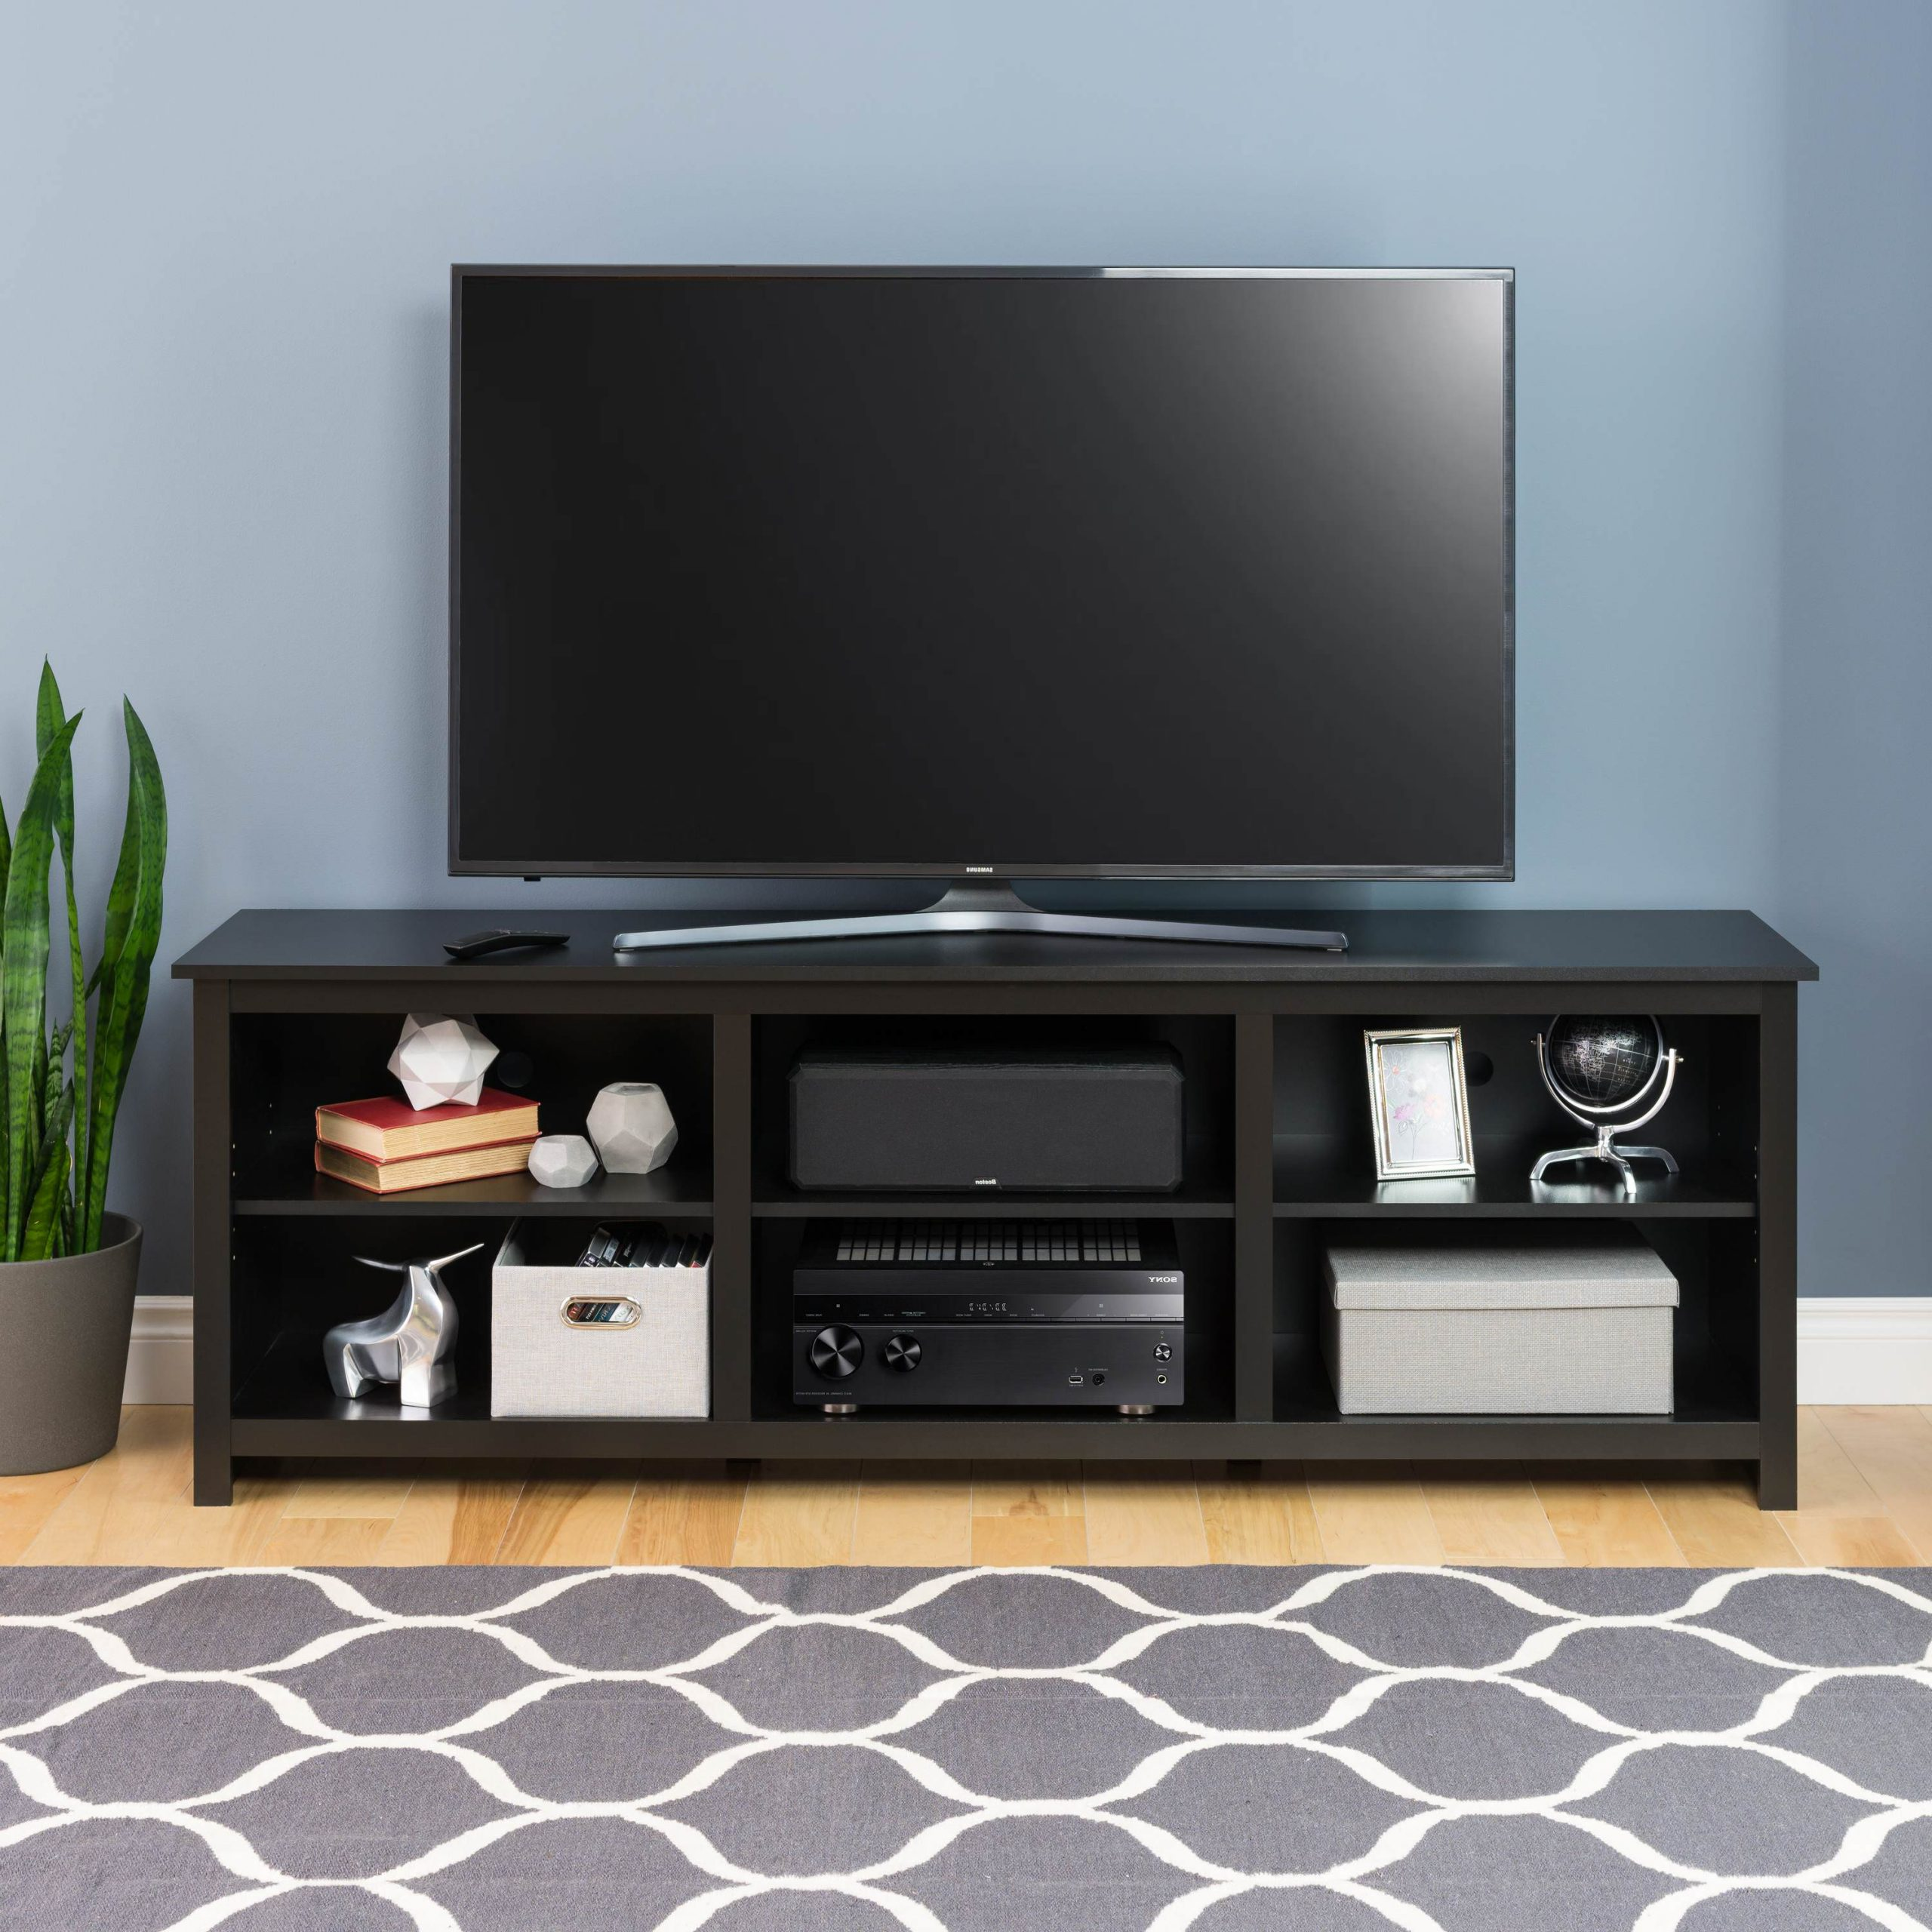 Sonoma 72 Inch Tv Stand, Black – Walmart – Walmart For Edgeware Black Tv Stands (View 13 of 20)